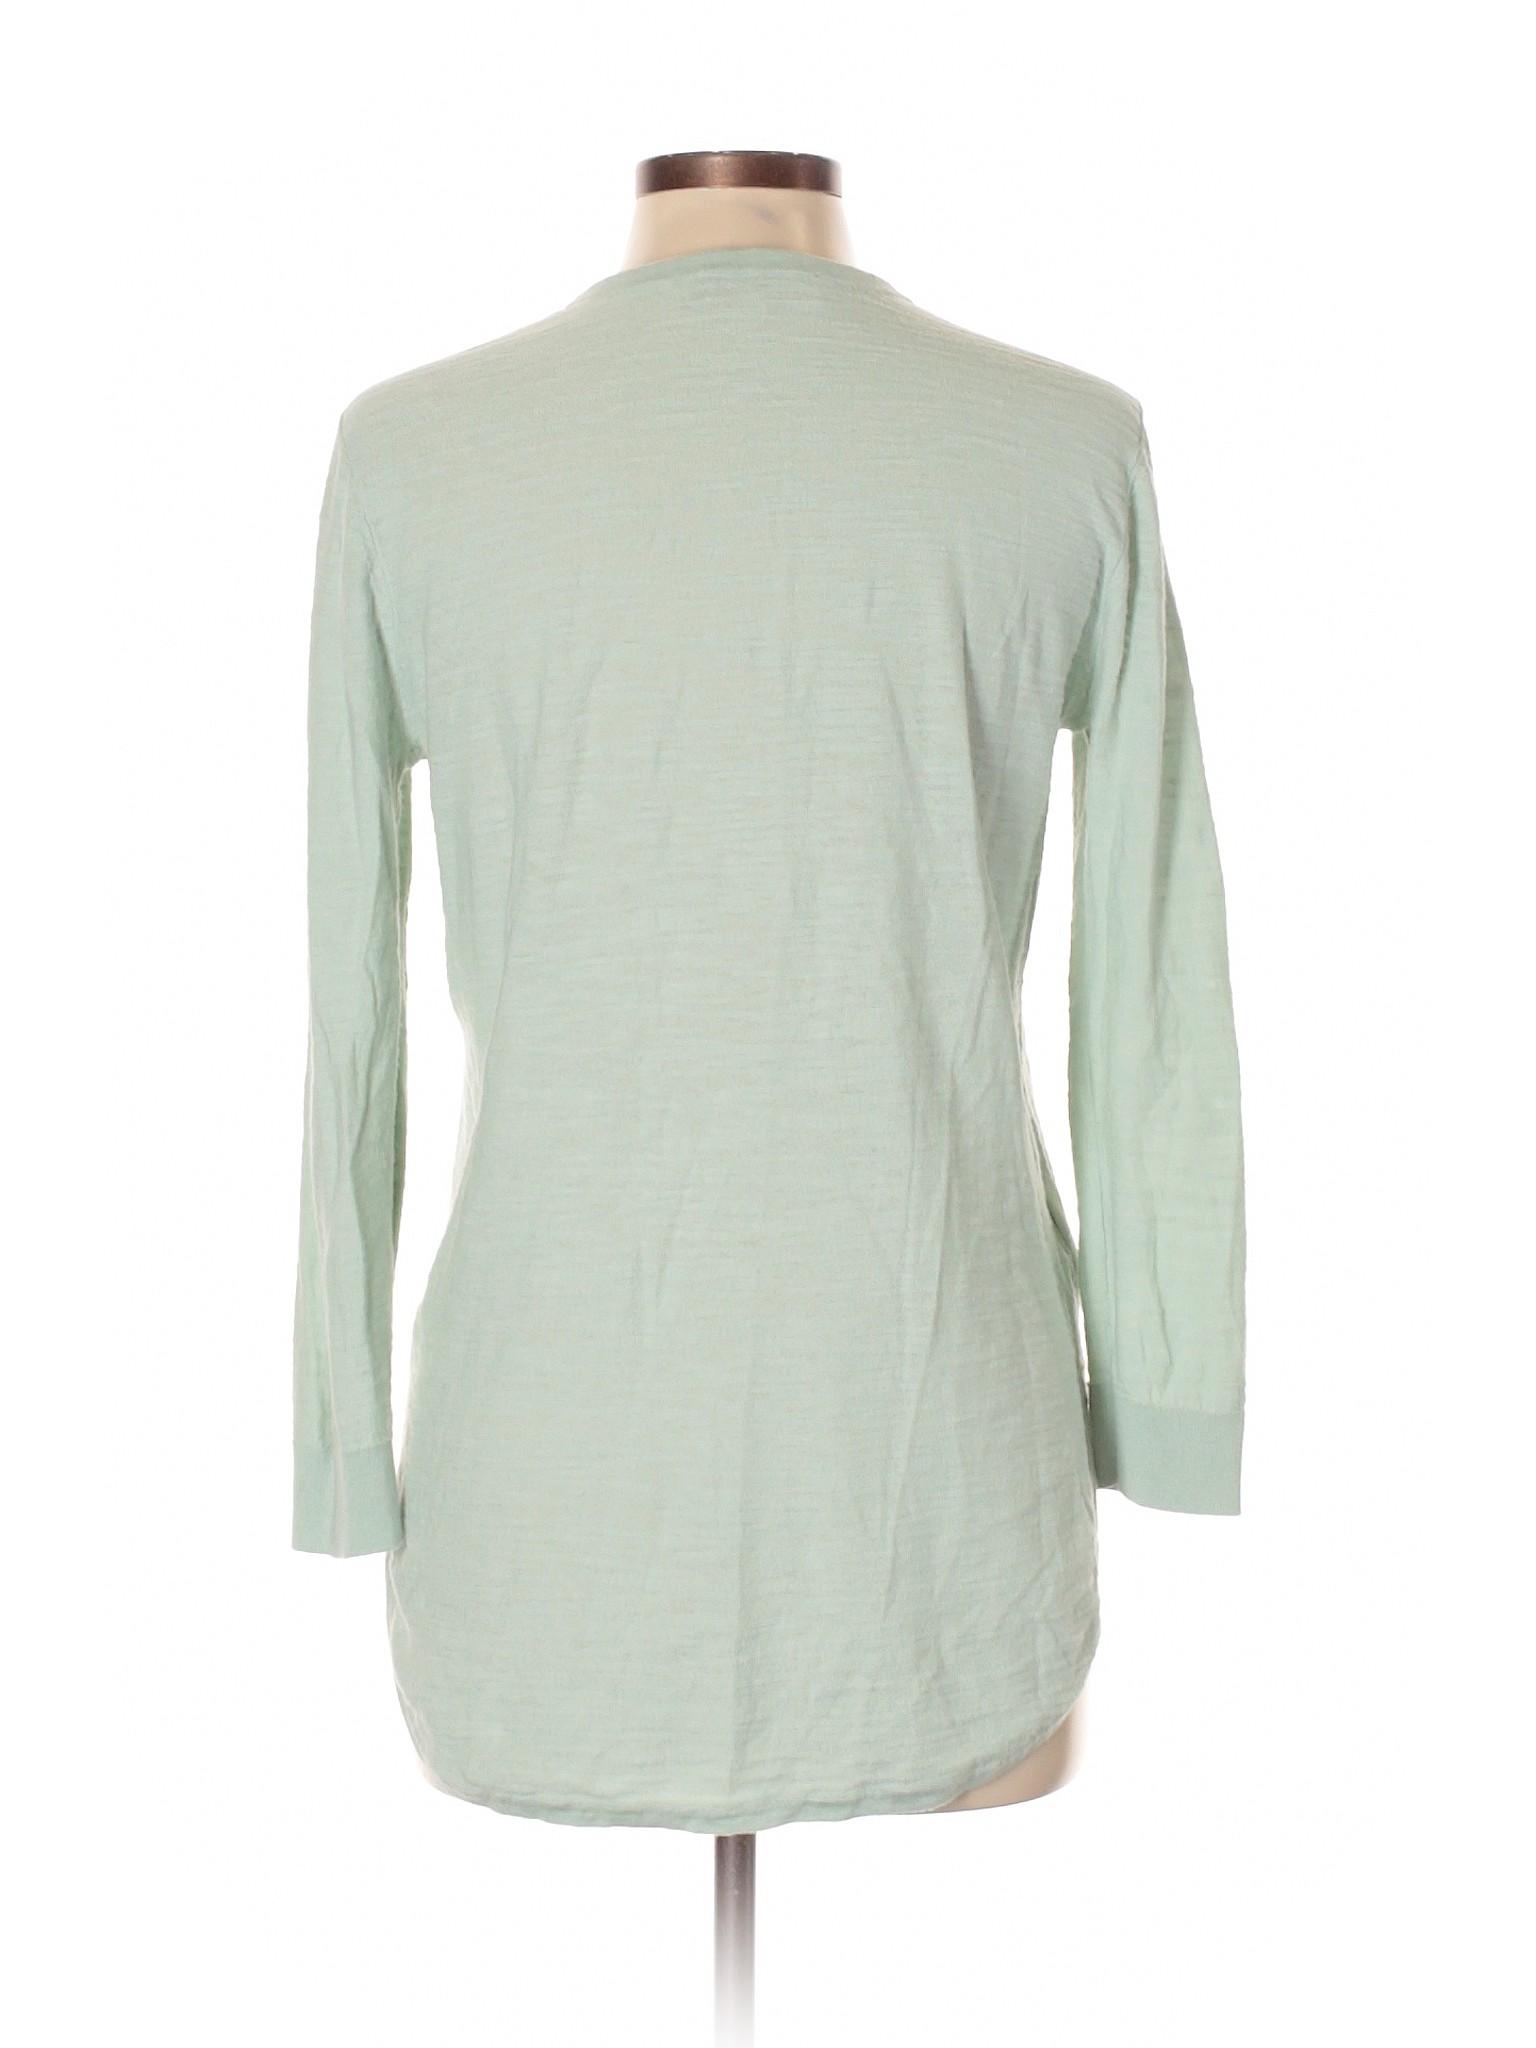 Taylor Pullover Ann Boutique Sweater LOFT 5pw6nR7qx